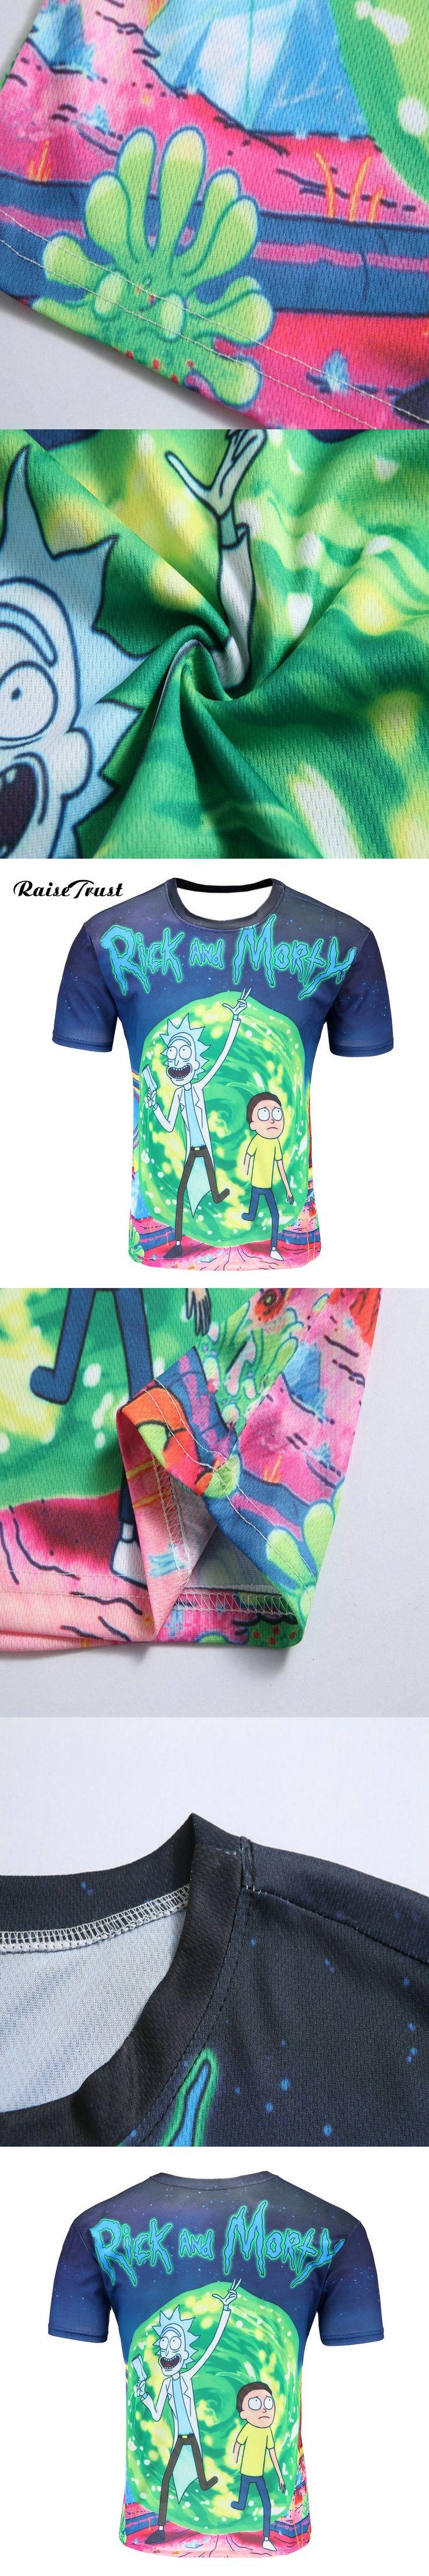 Fashion Men/Women 3d T-Shirt Printed rick  morty Funny Anime tee shirts Summer Short sleeves Hip Hop Style O-neck t shirt